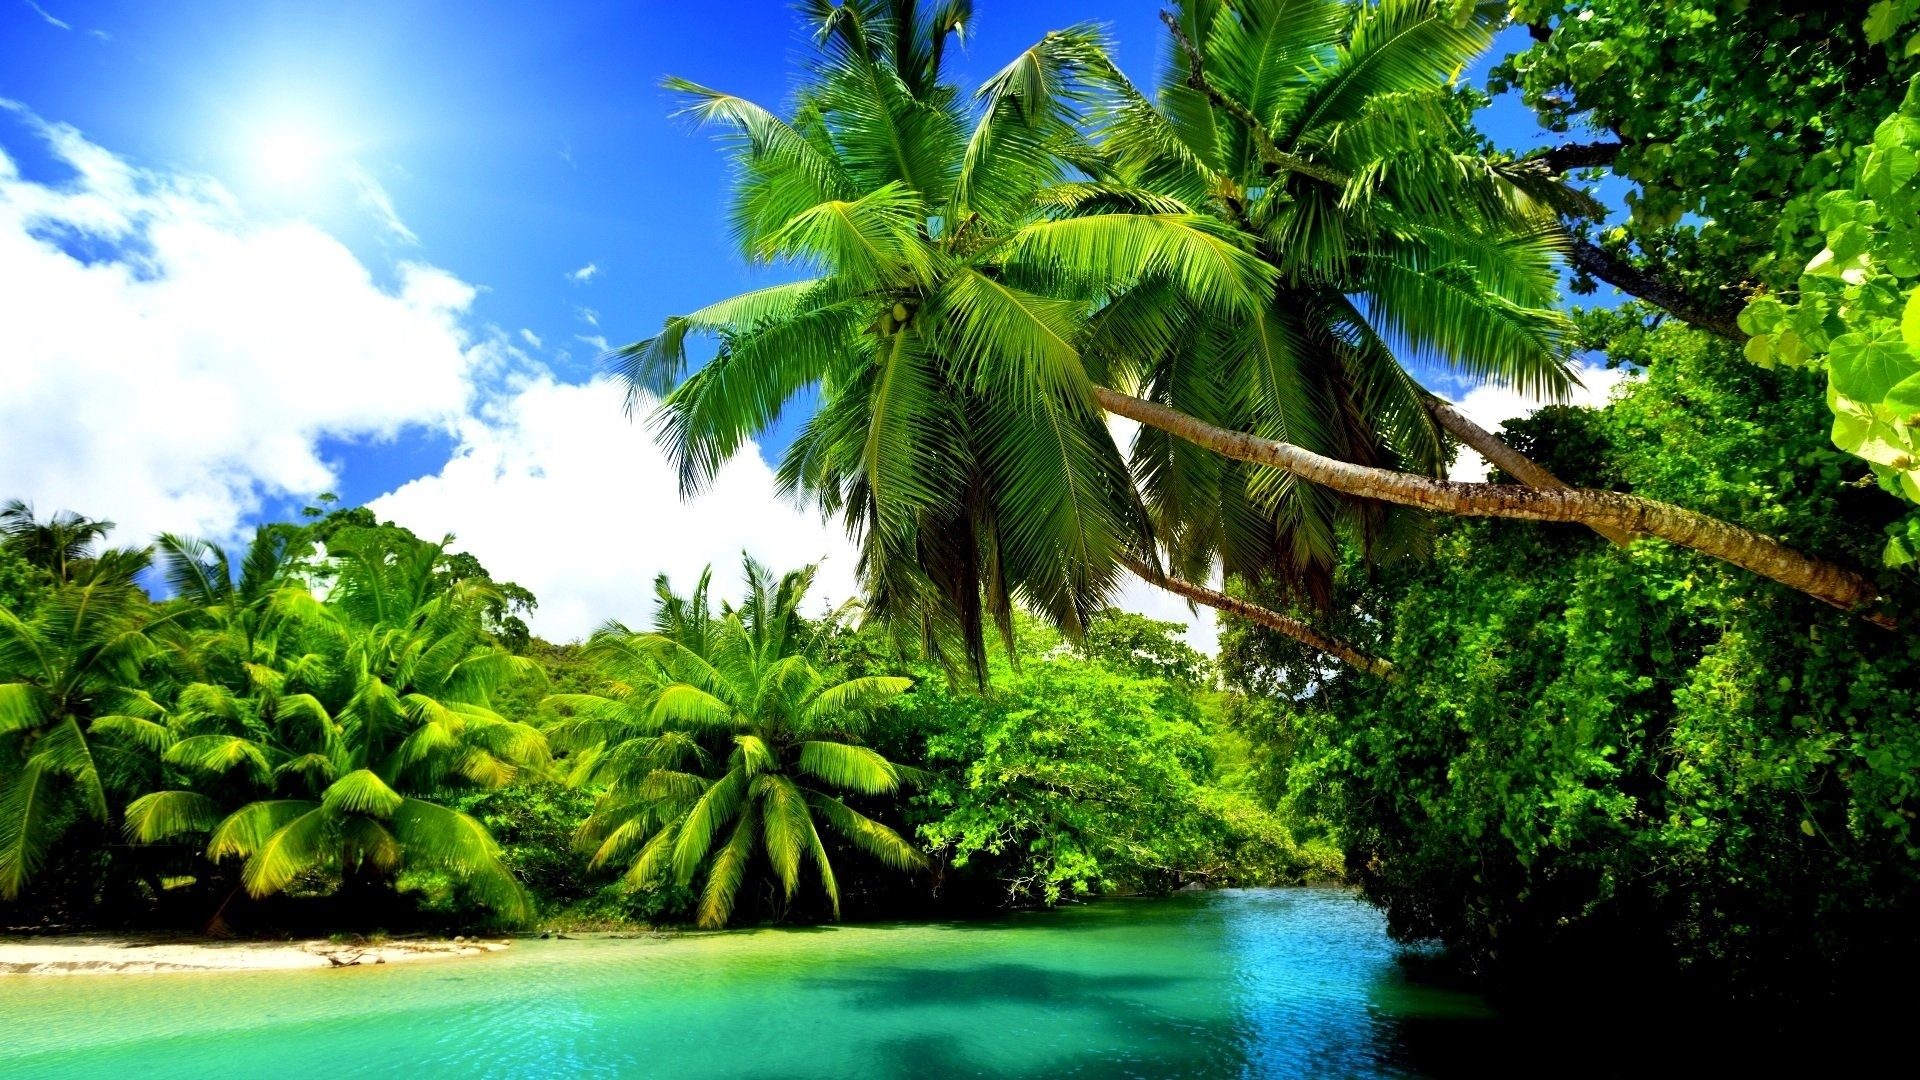 Paradise hd wallpaper download